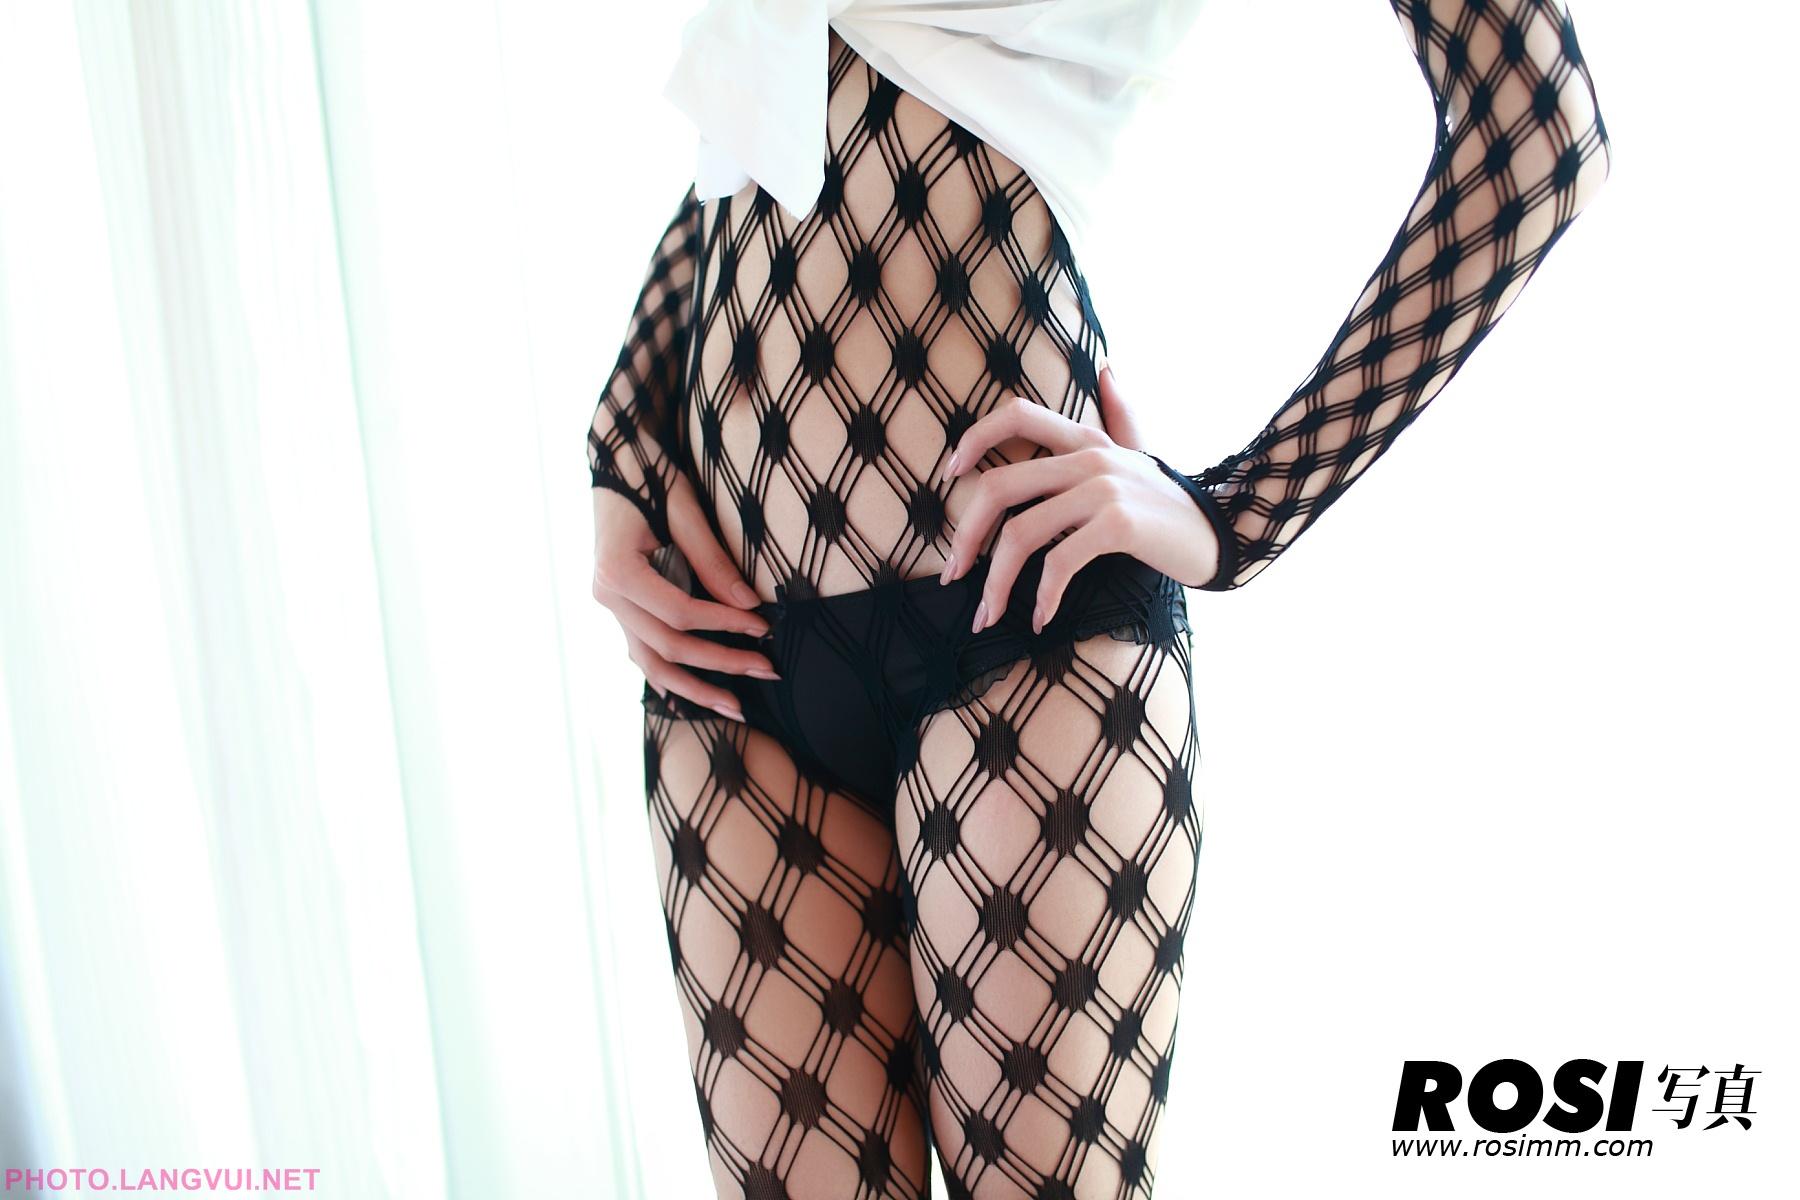 ROSI No 251